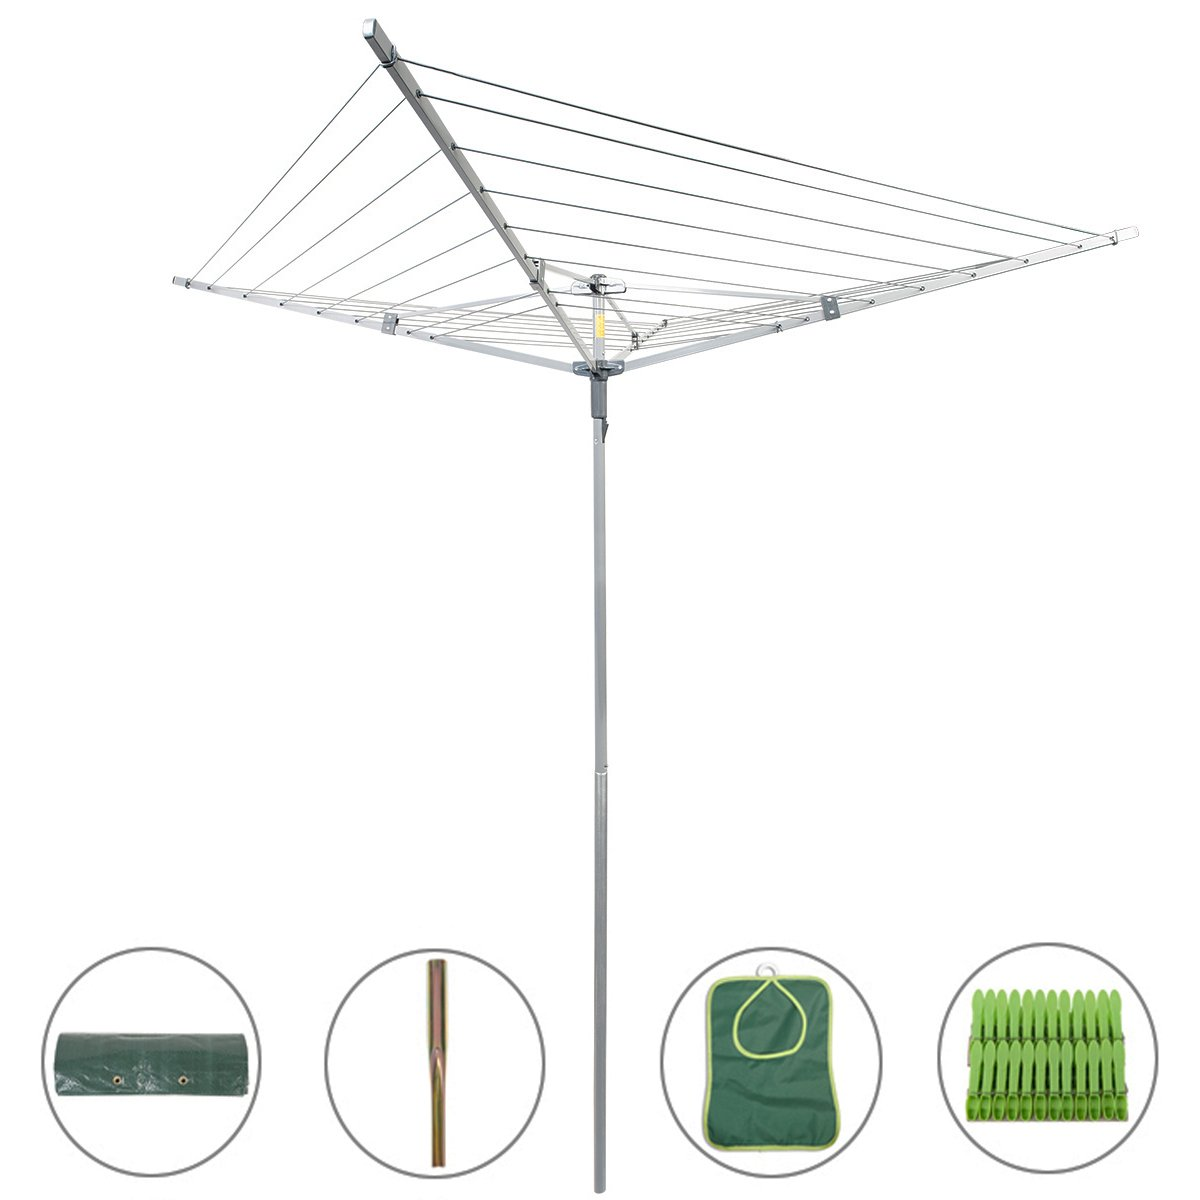 Drynatural 折りたたみ 4アームロータリー屋外傘乾燥 131フィート 乾燥スペース 衣服乾燥機物 干し ラック 131FT シルバー&ブラック   B074861JXM